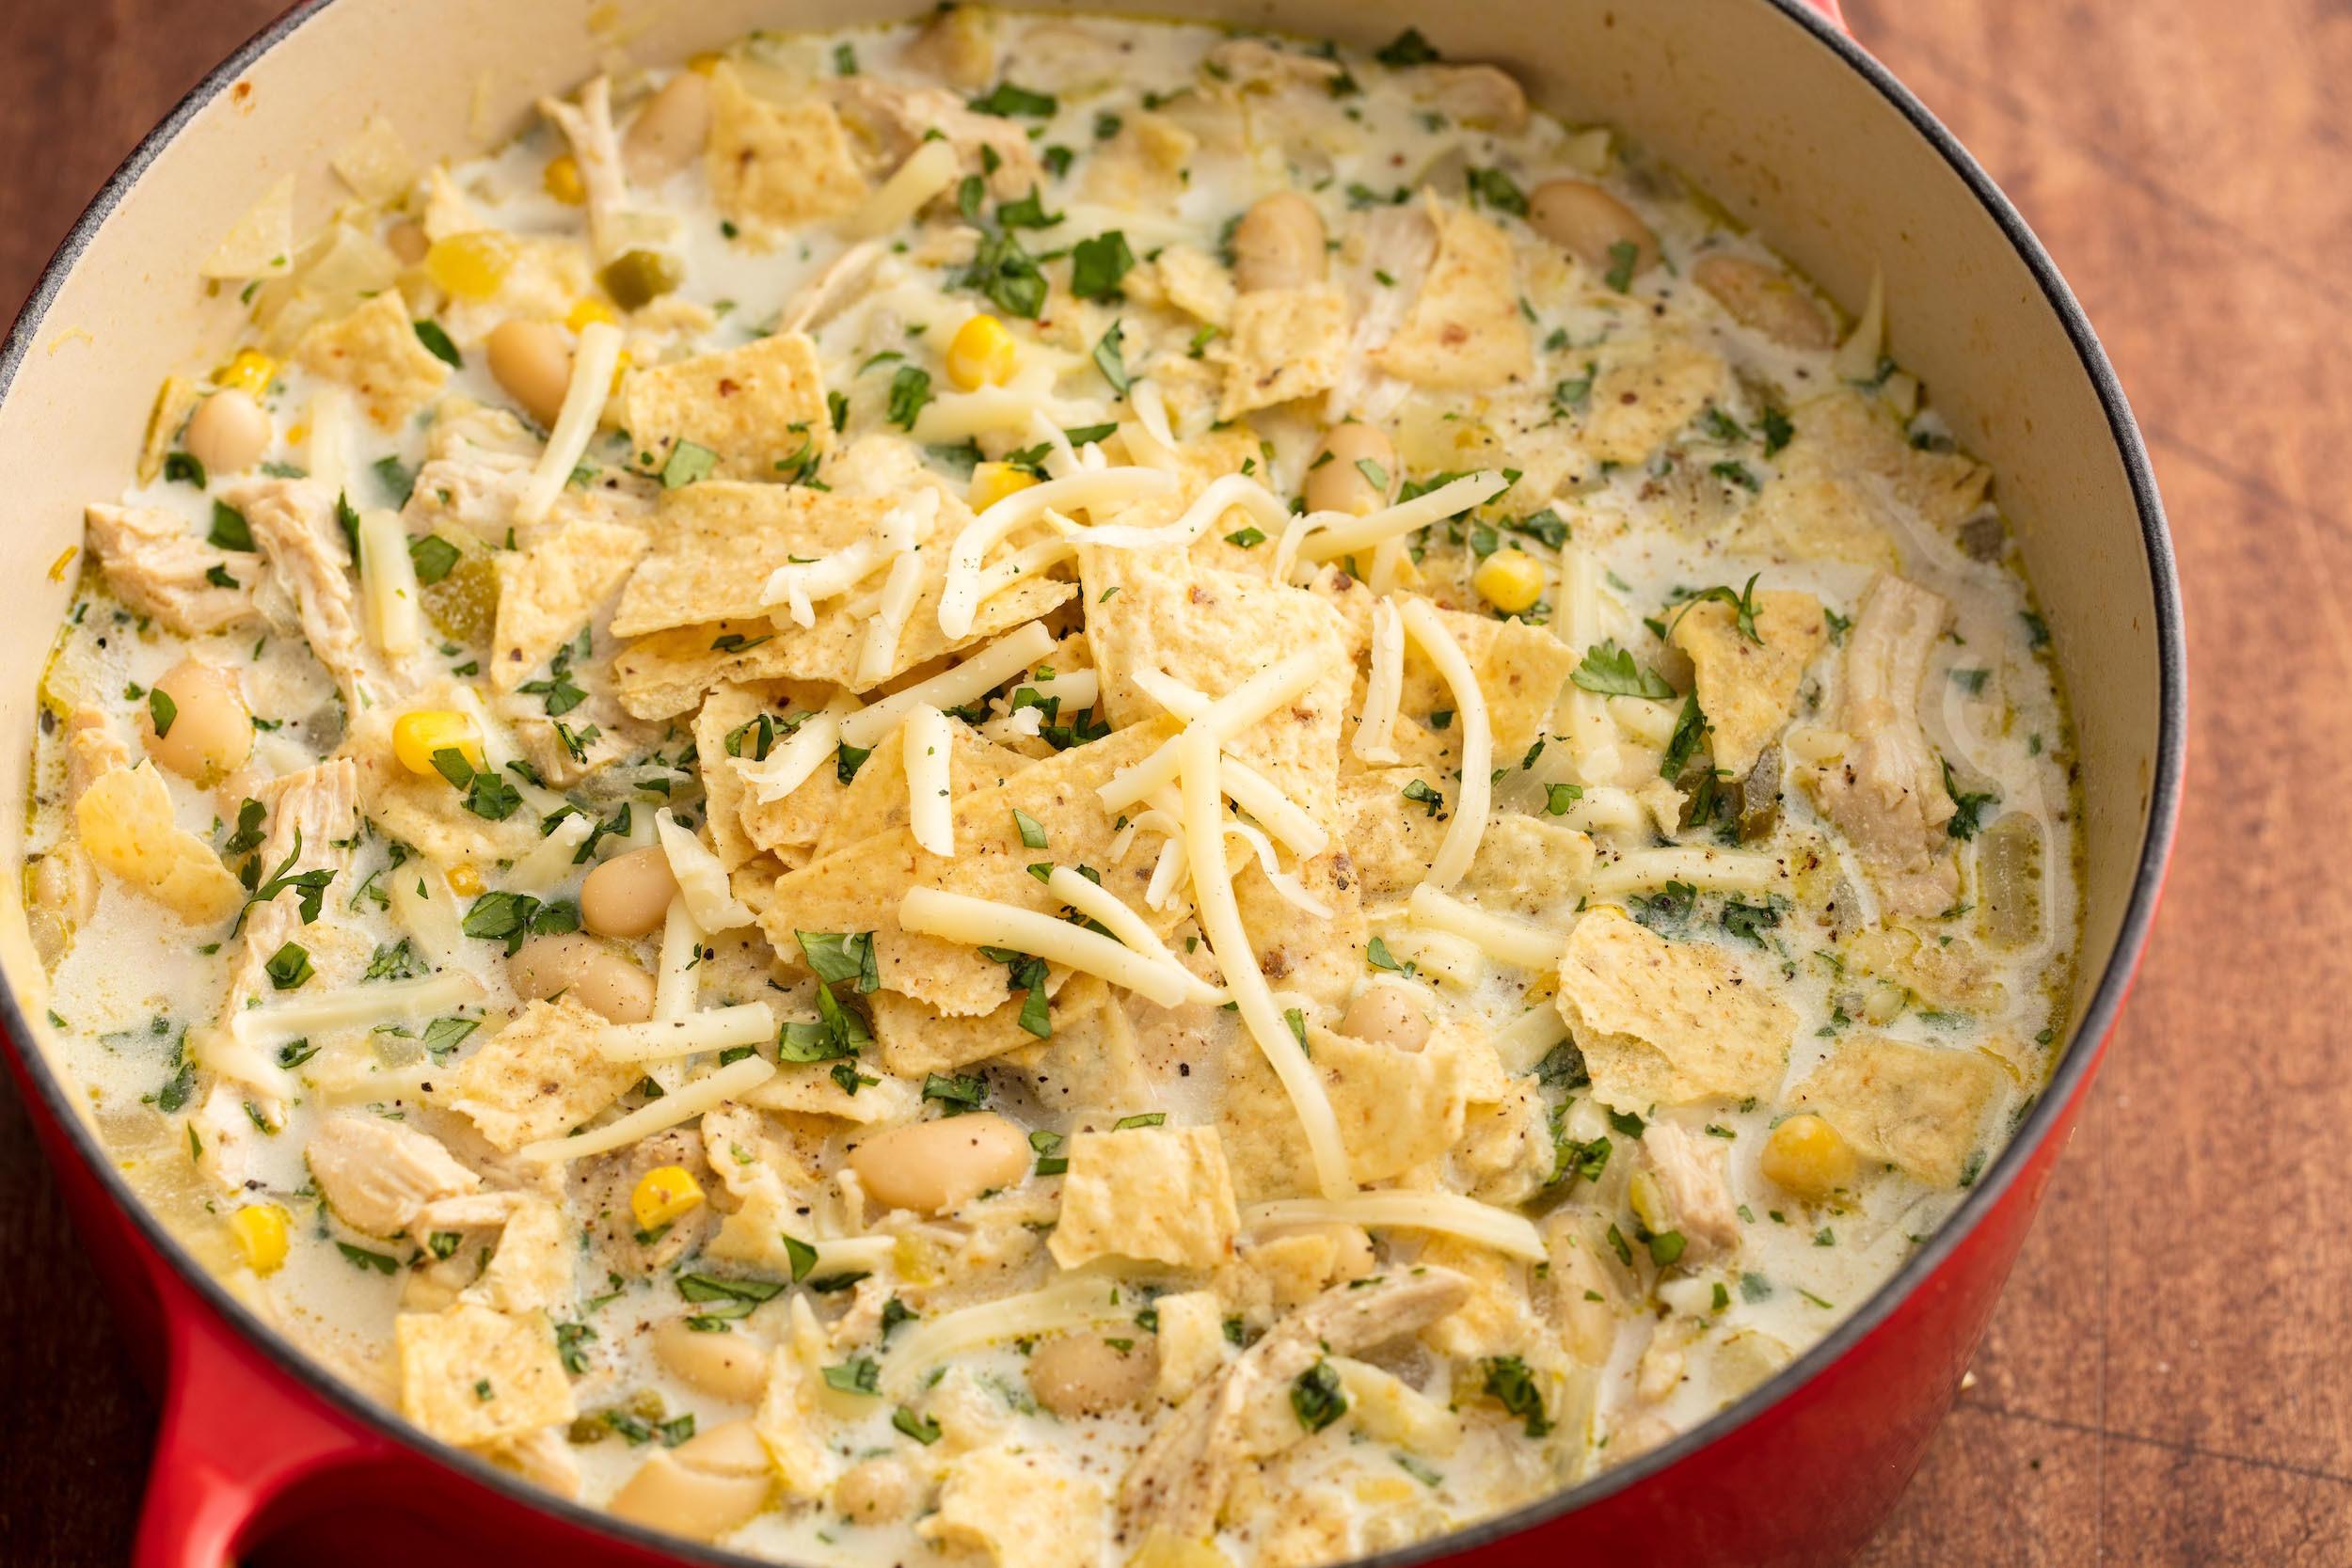 Quick Chicken Dinner  150 Easy Chicken Dinner Recipes — Simple Ideas for Quick